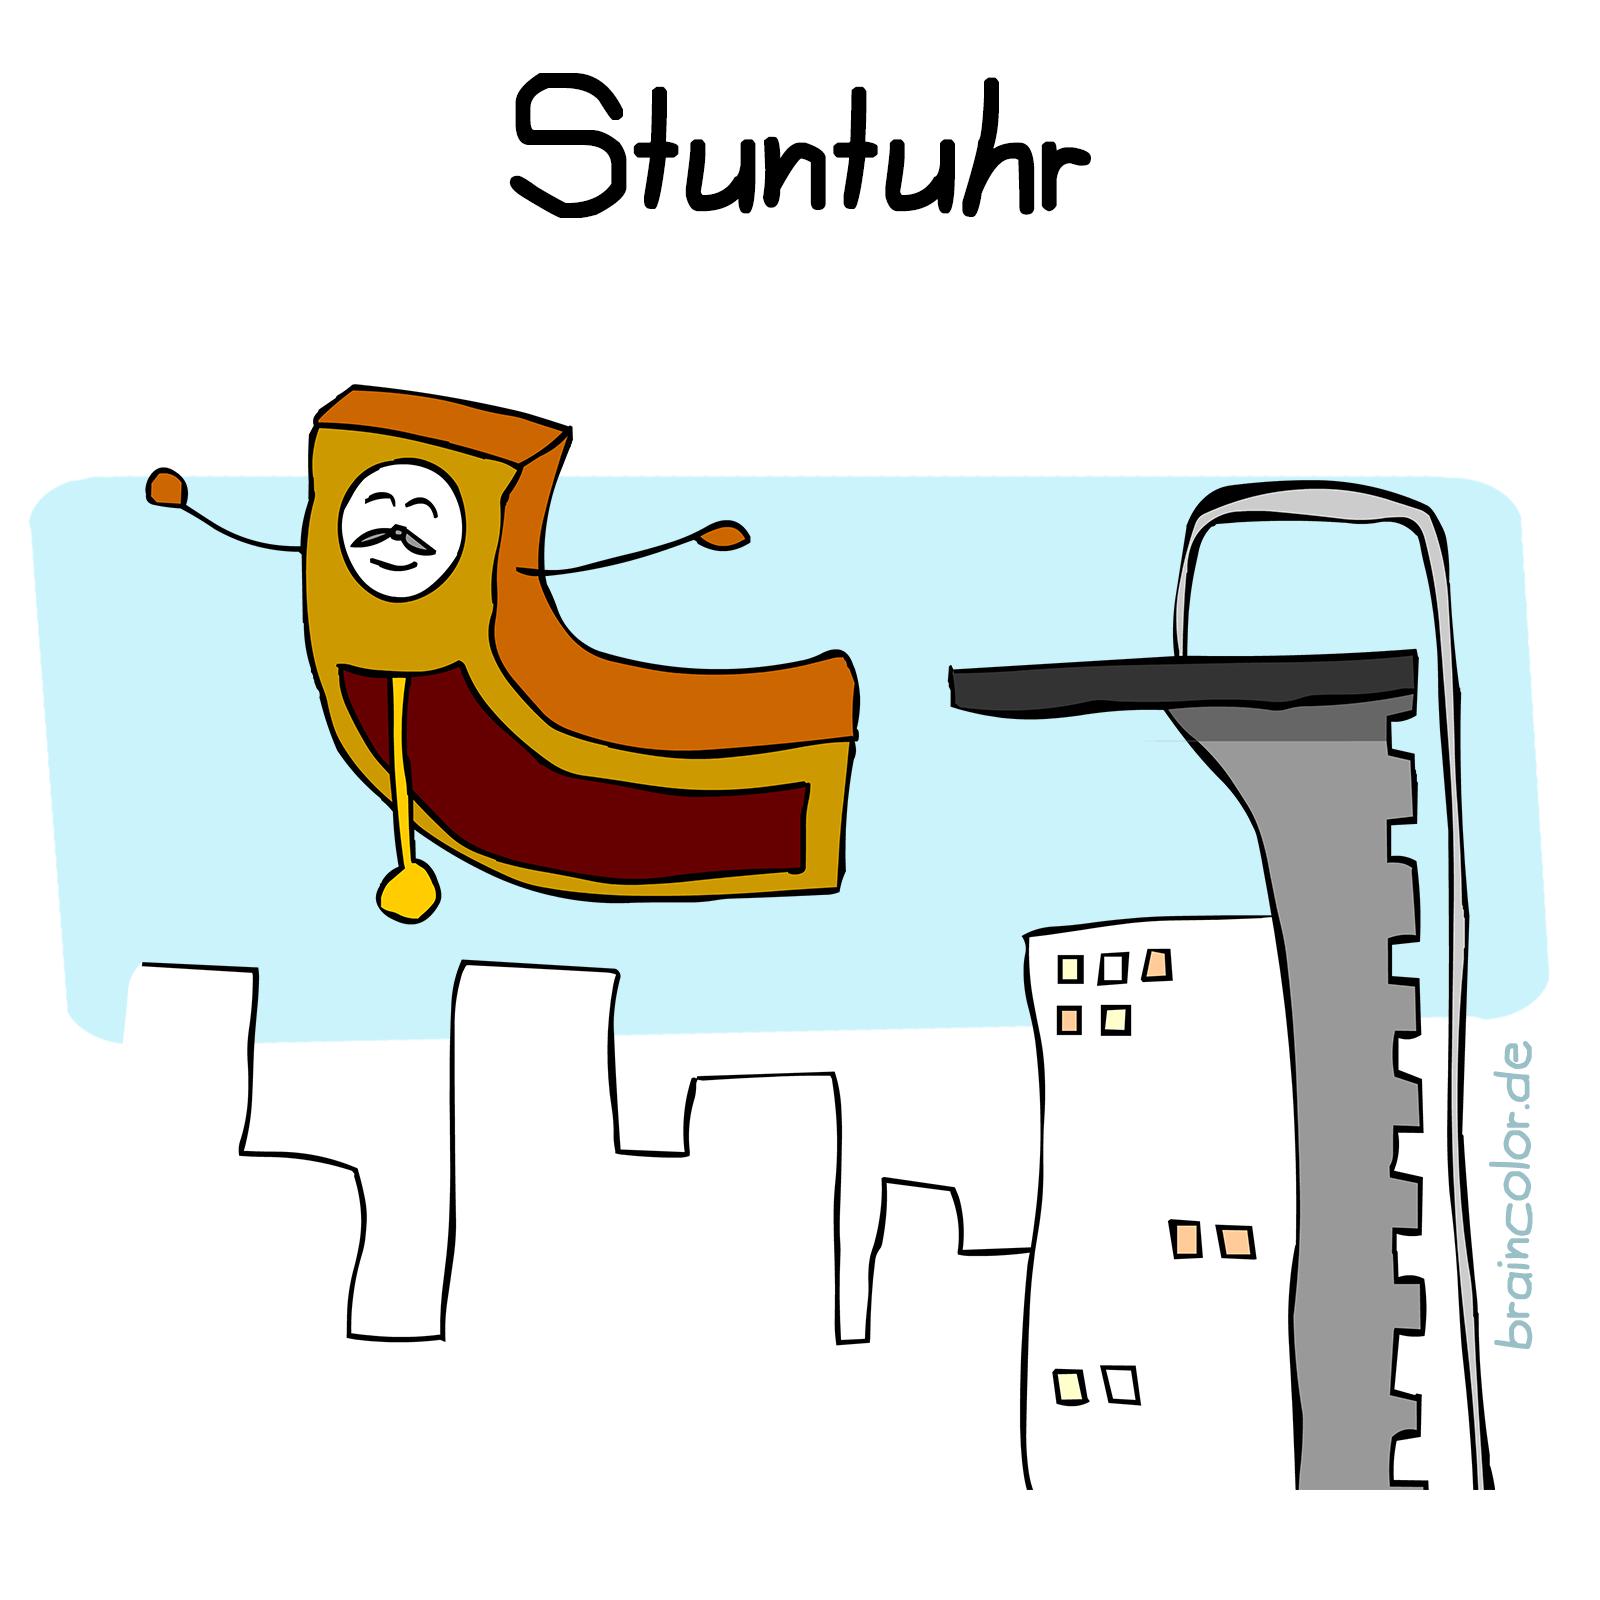 standuhr